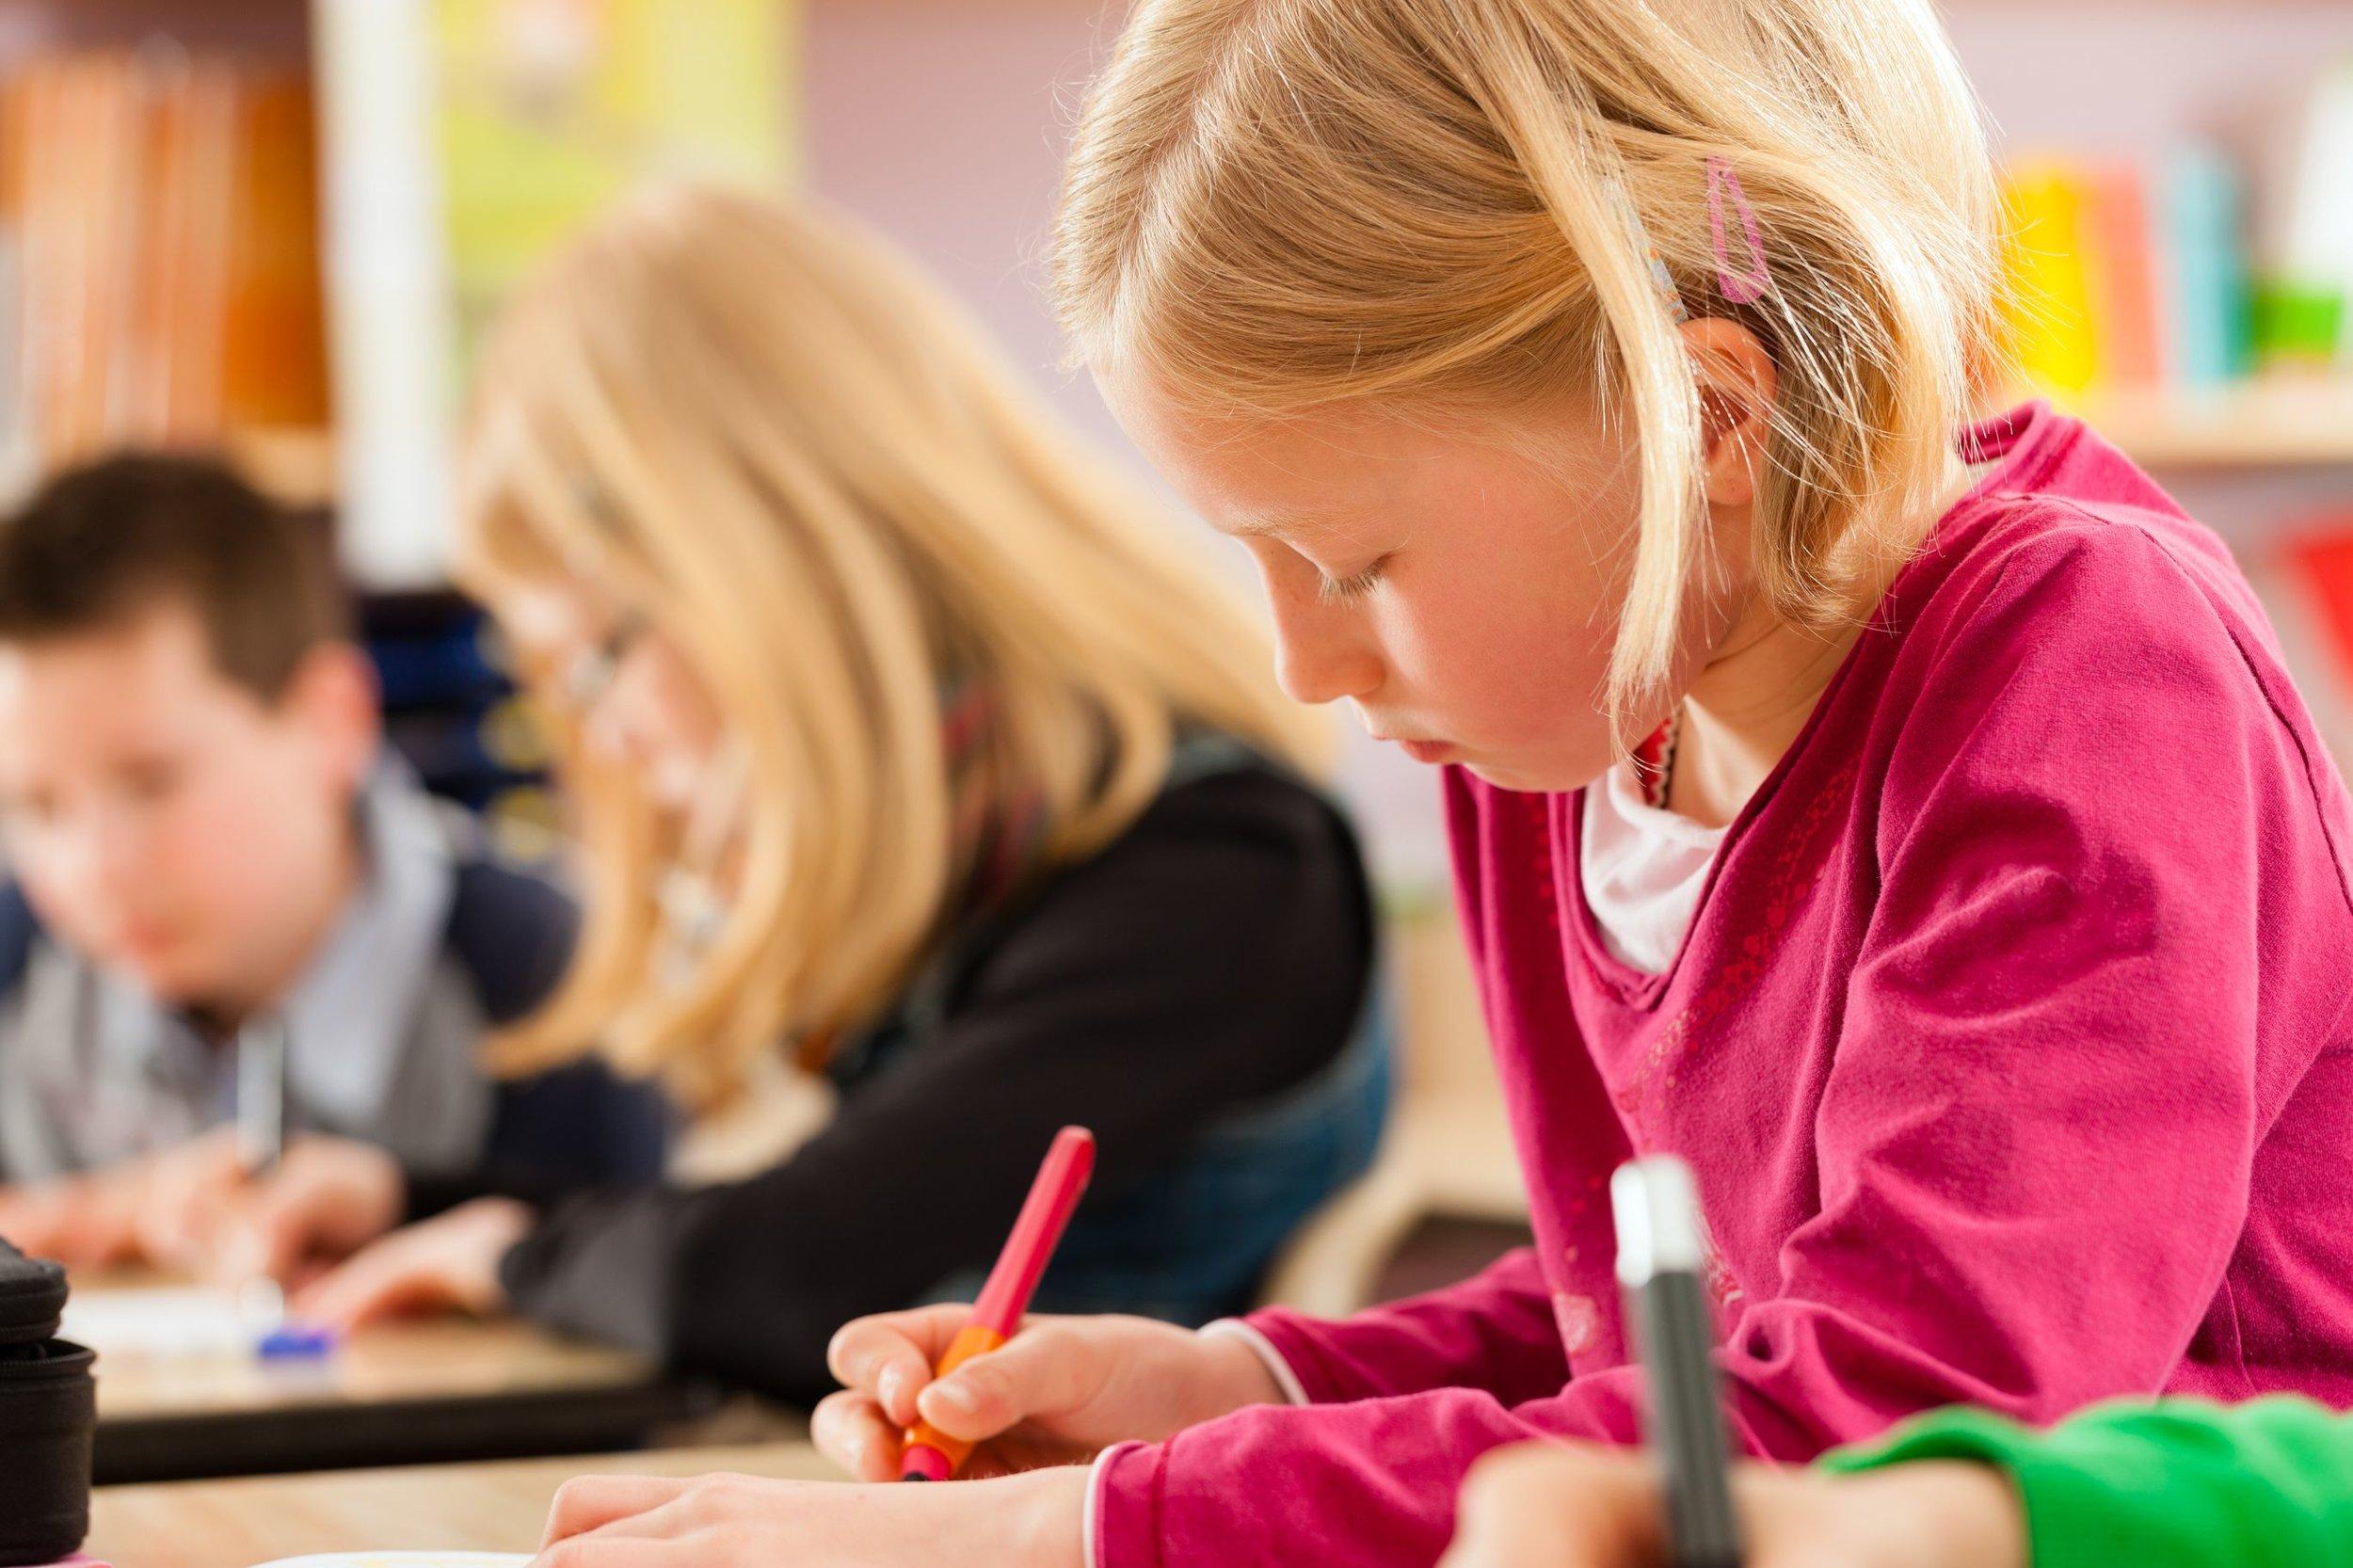 education-pupils-at-school-doing-homework-38767129-compressor.jpg